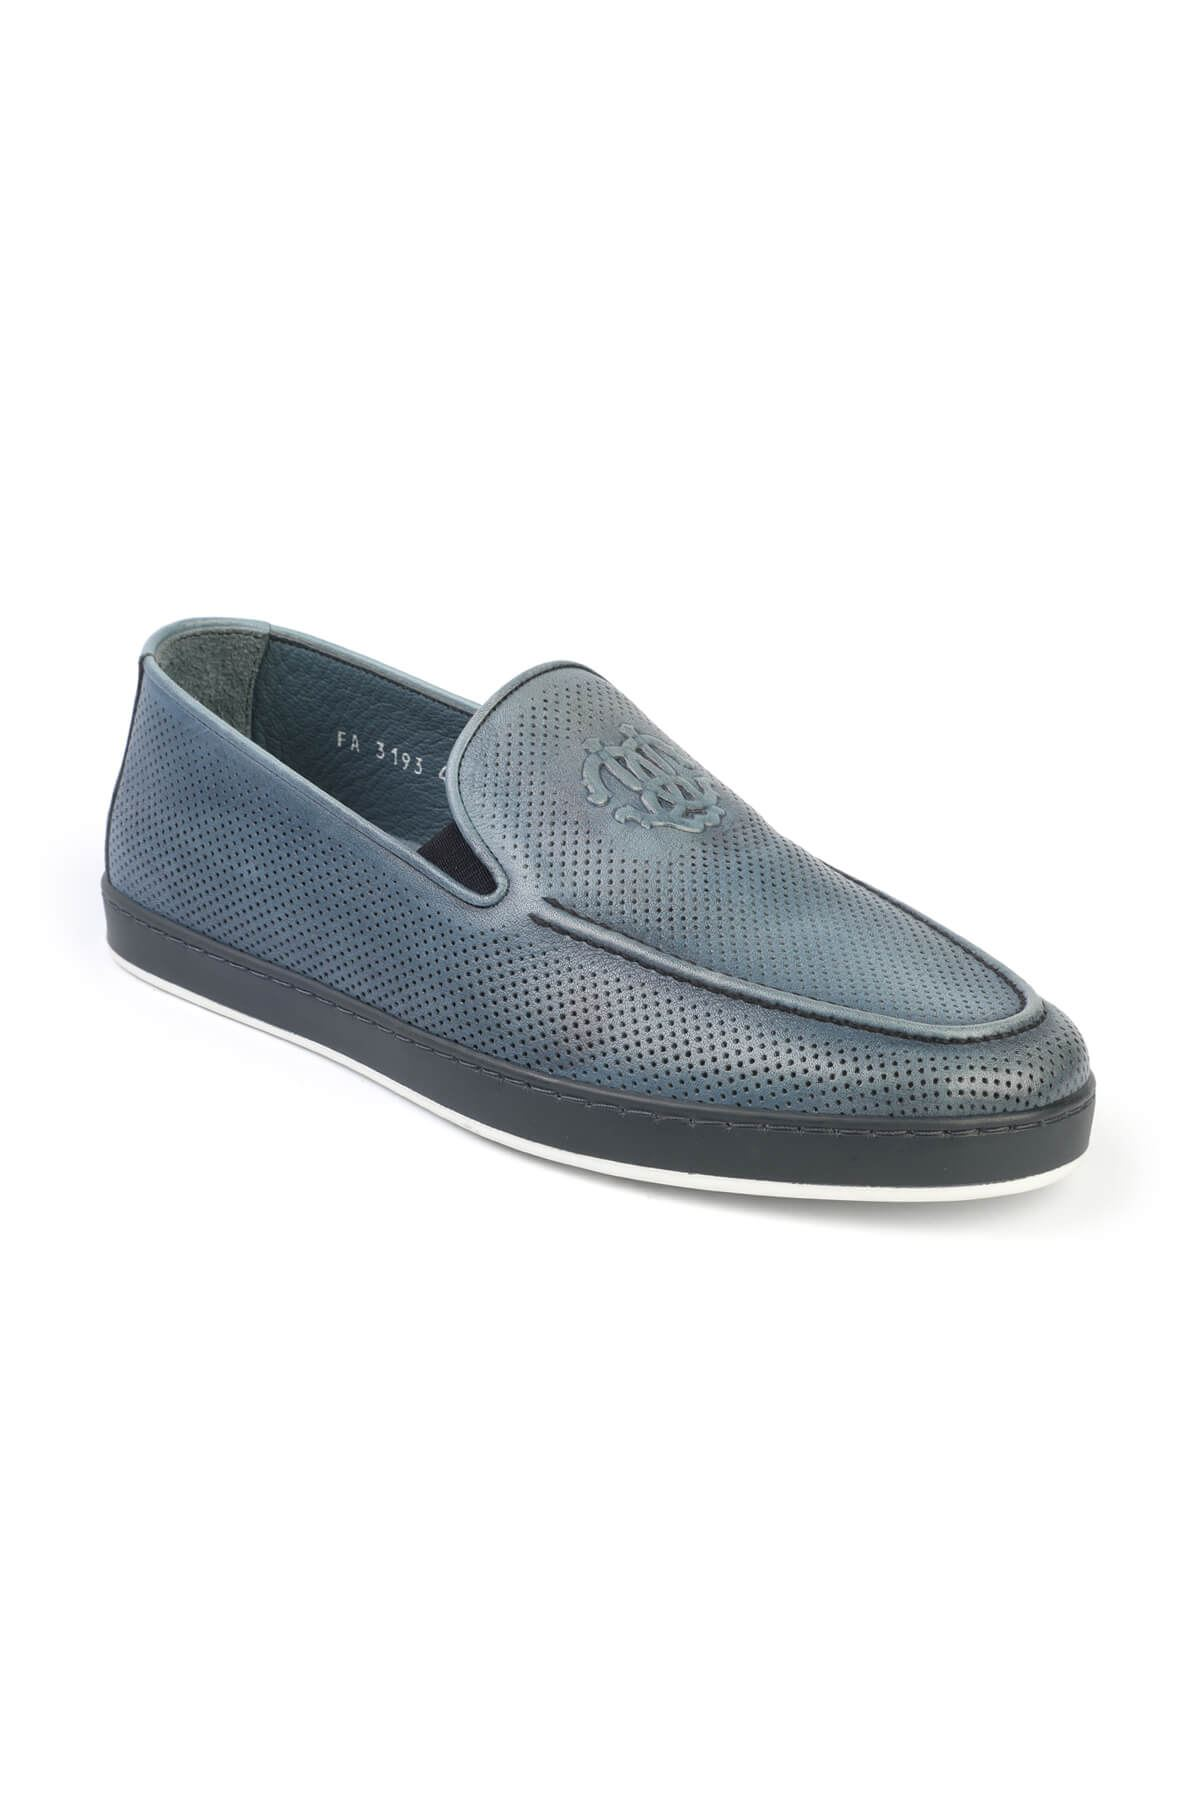 Libero 3193 Blue Loafer Shoes